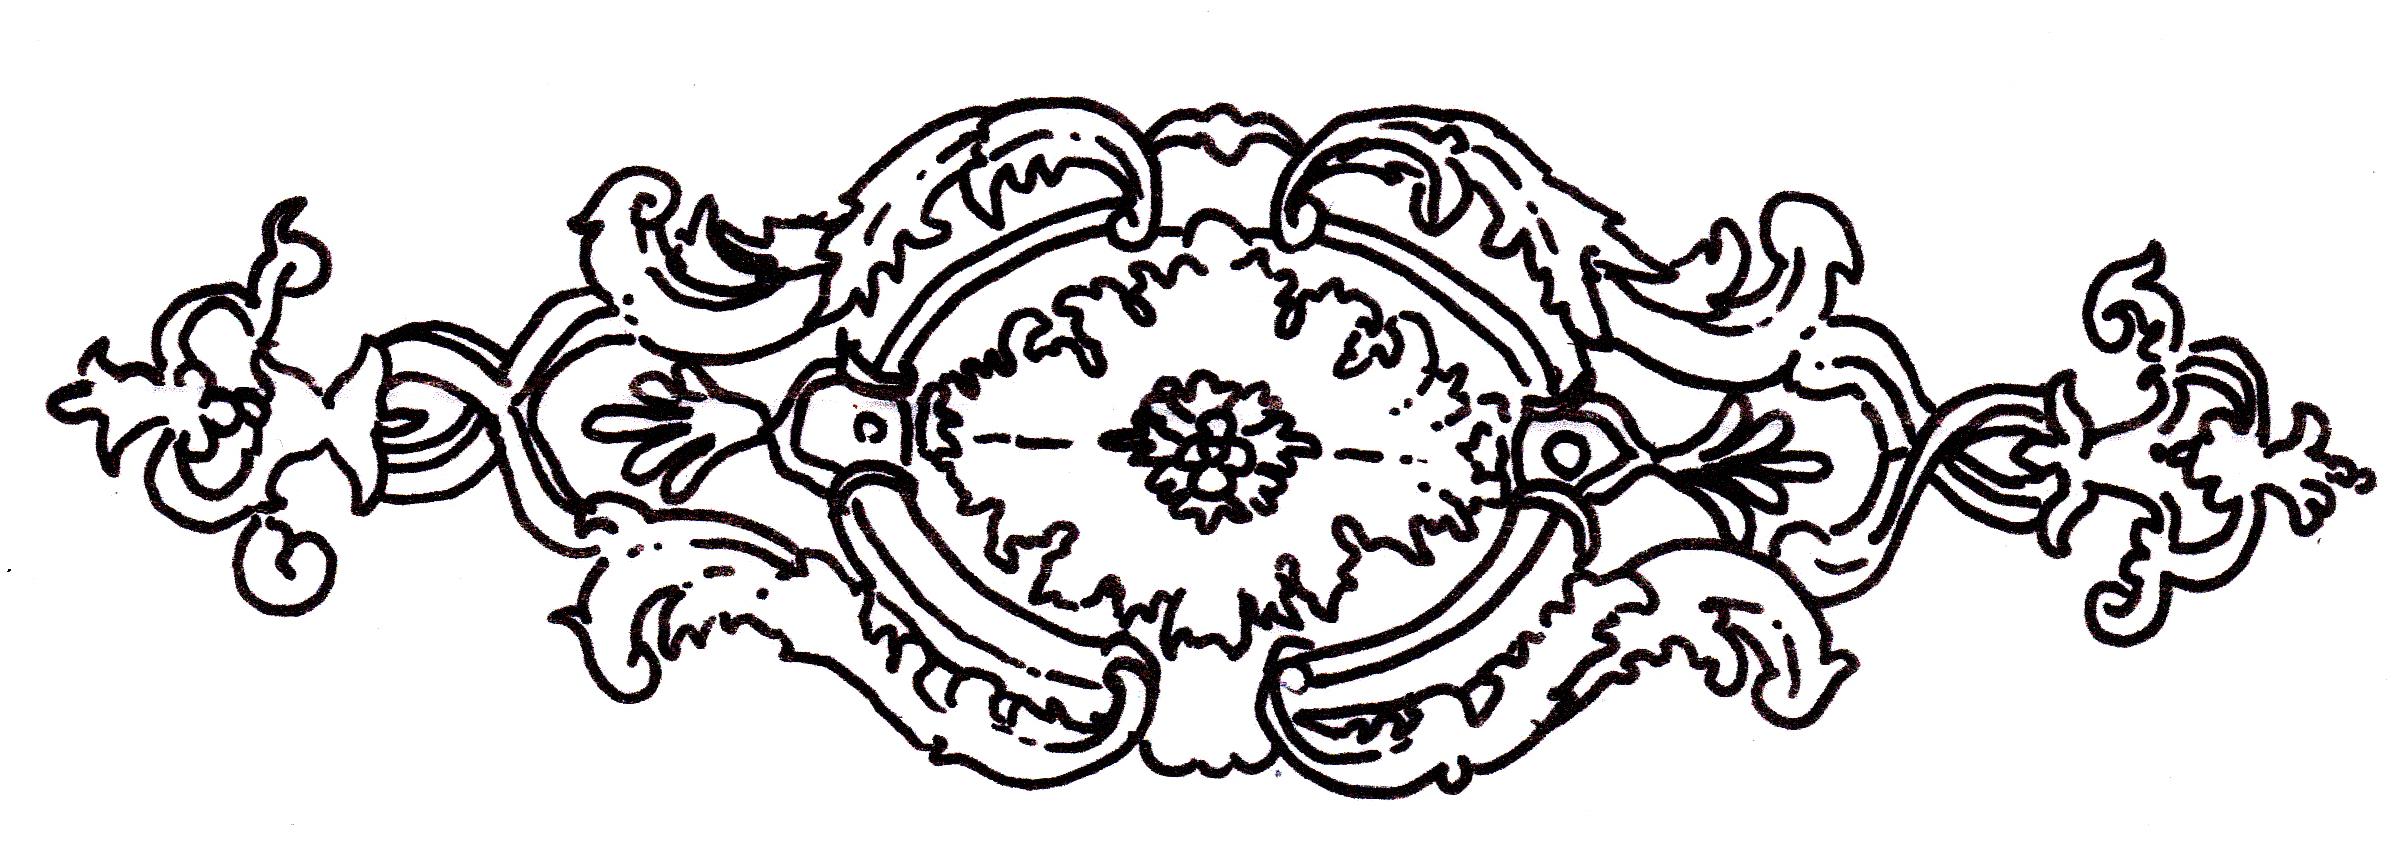 Wooden Decorative Scroll Saw Ornamental Patterns PDF Plans